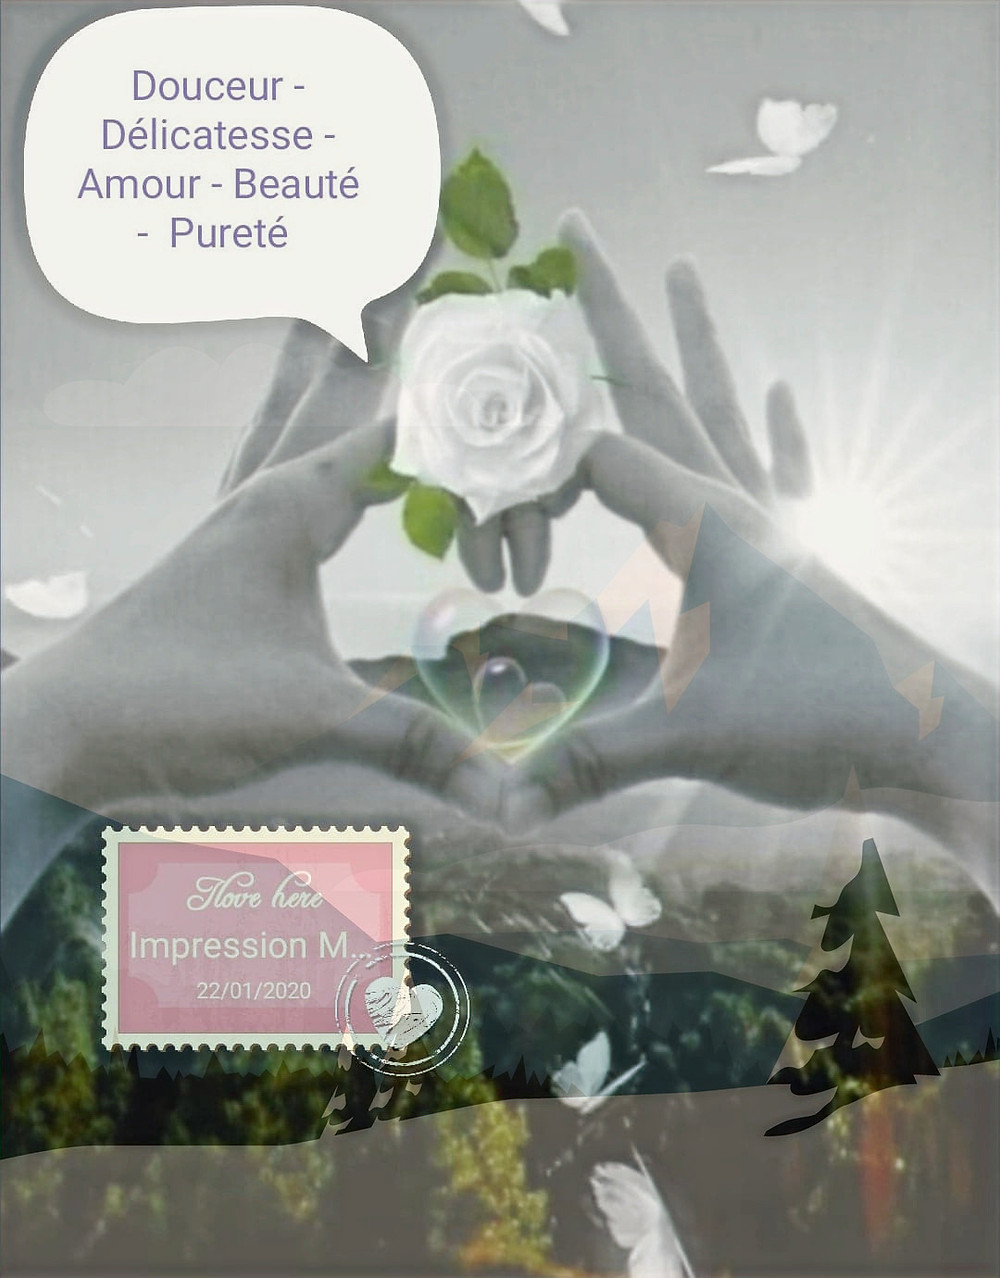 L'Offre Saint-Valentin Impression-Massage, Val d'Oise, 95, 78, Conflans, Herblay, Pontoise, Cergy